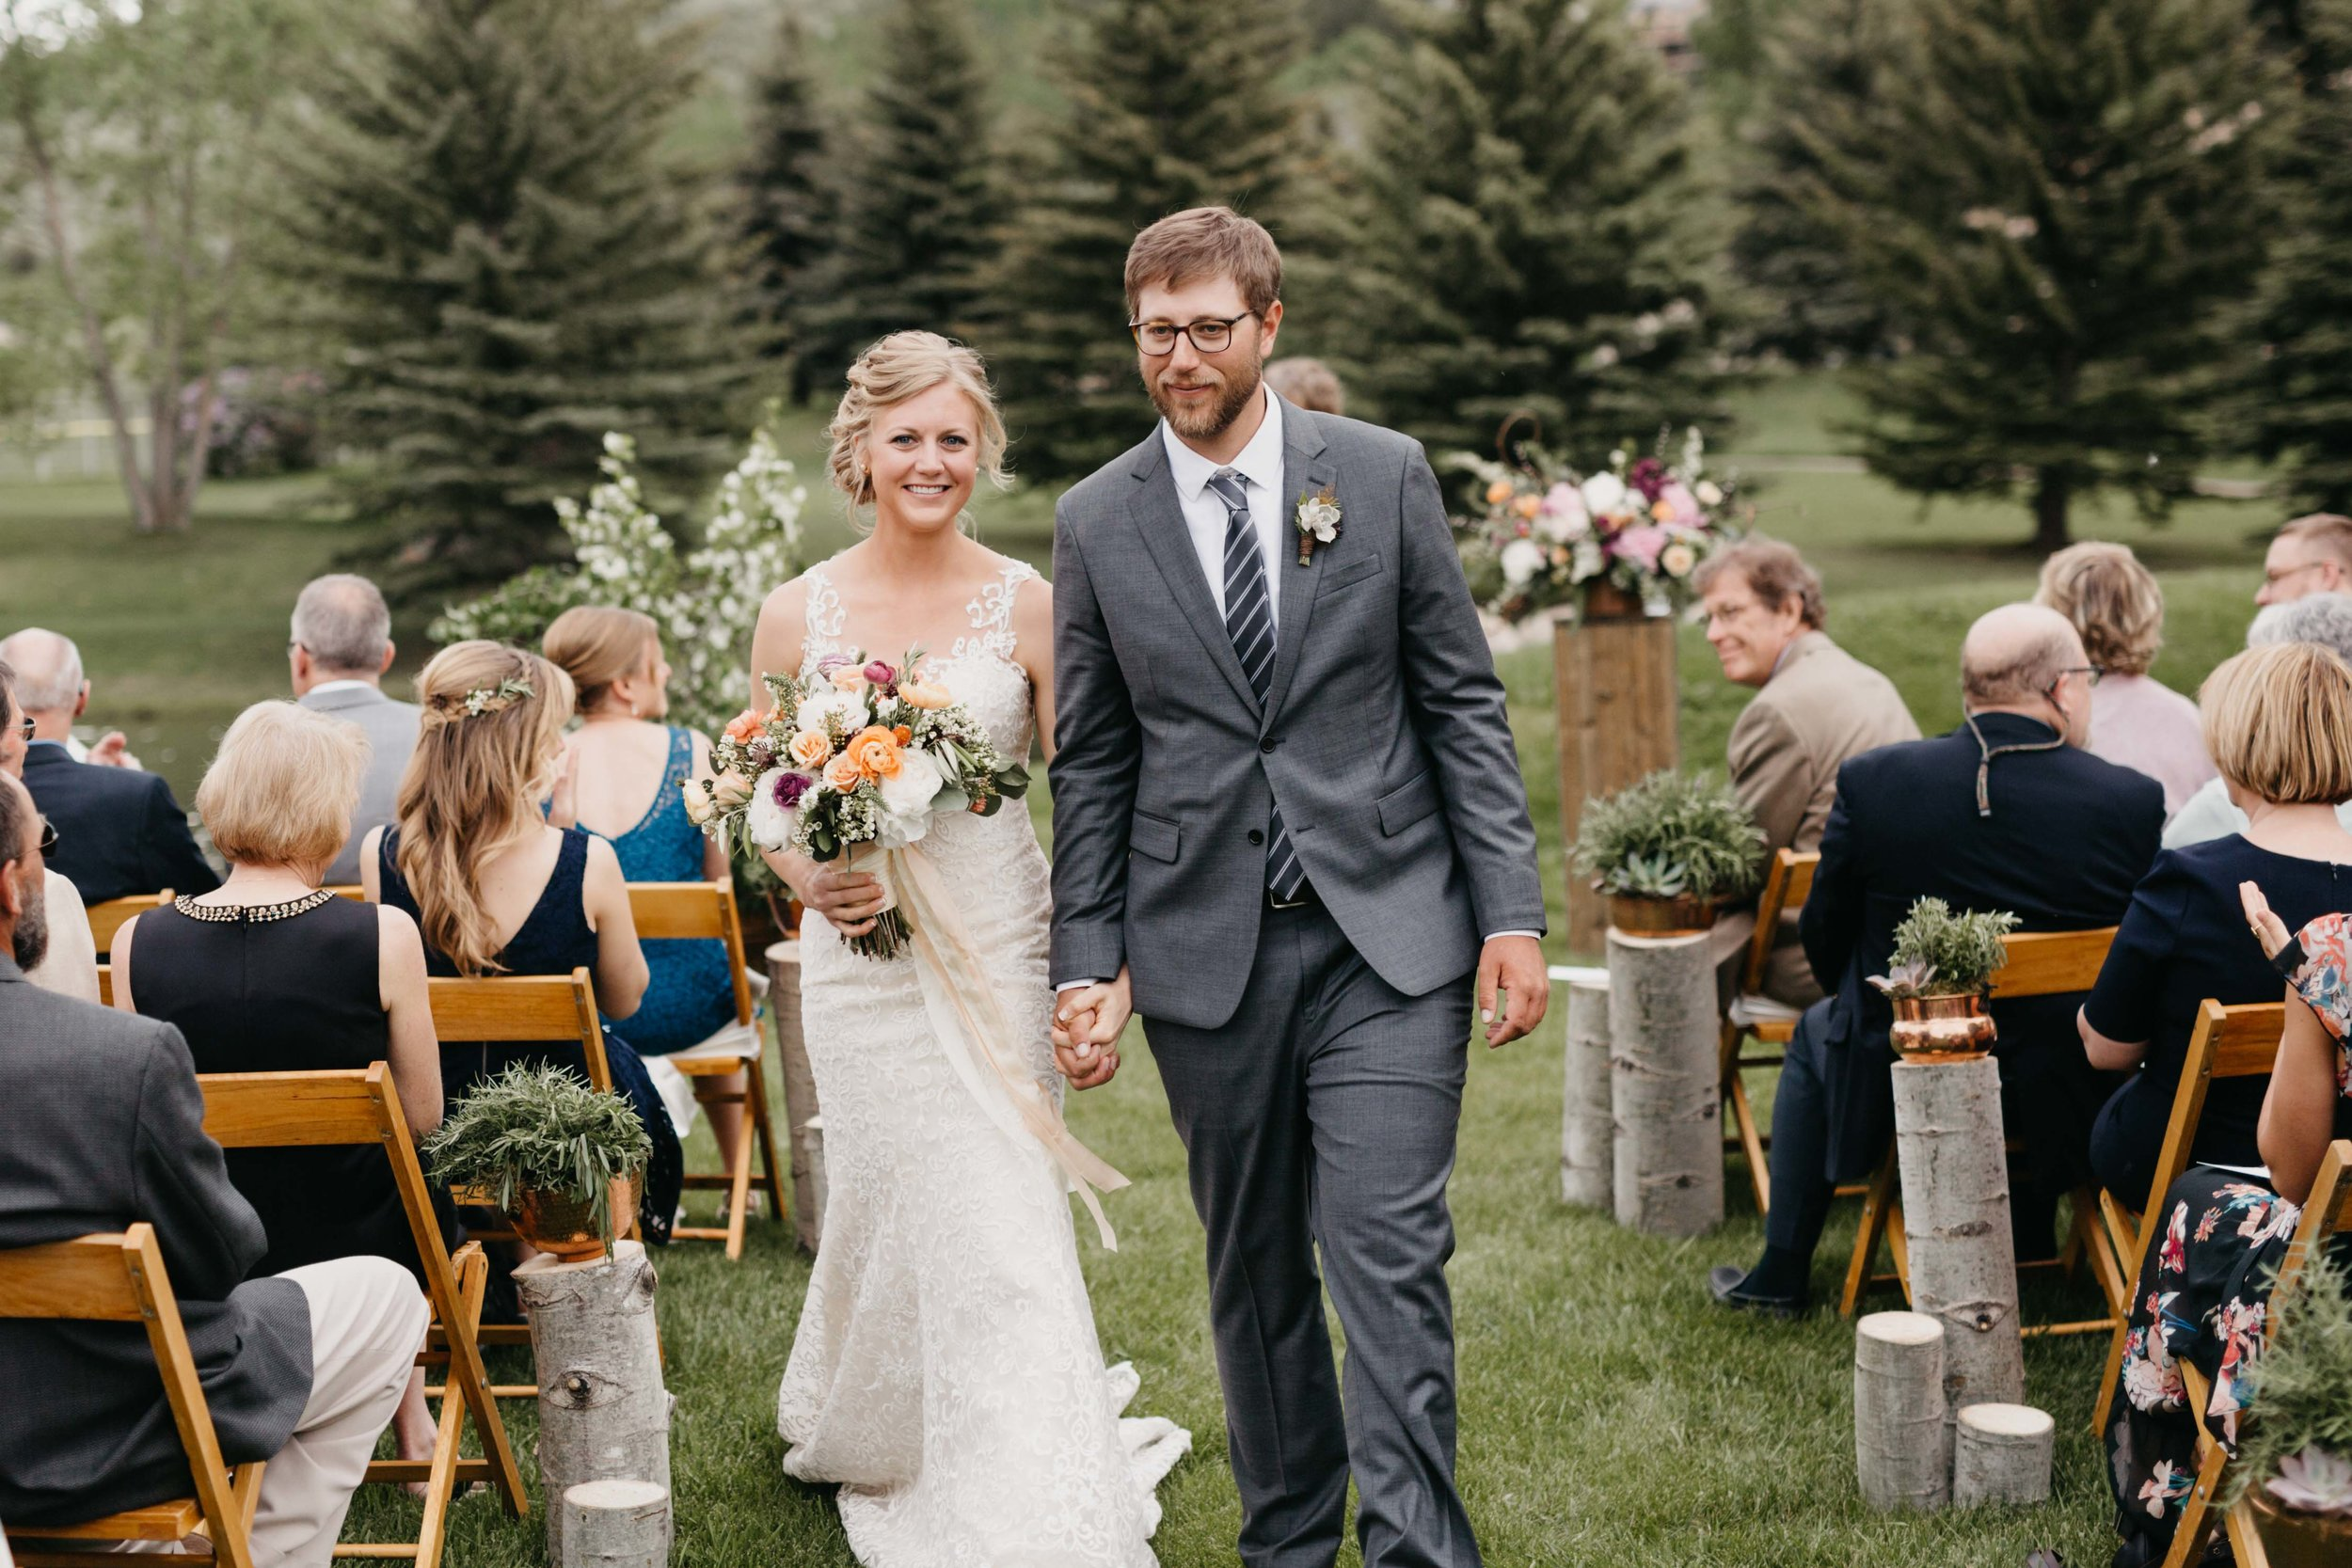 Colorado-Wedding-Photographer-70.jpg